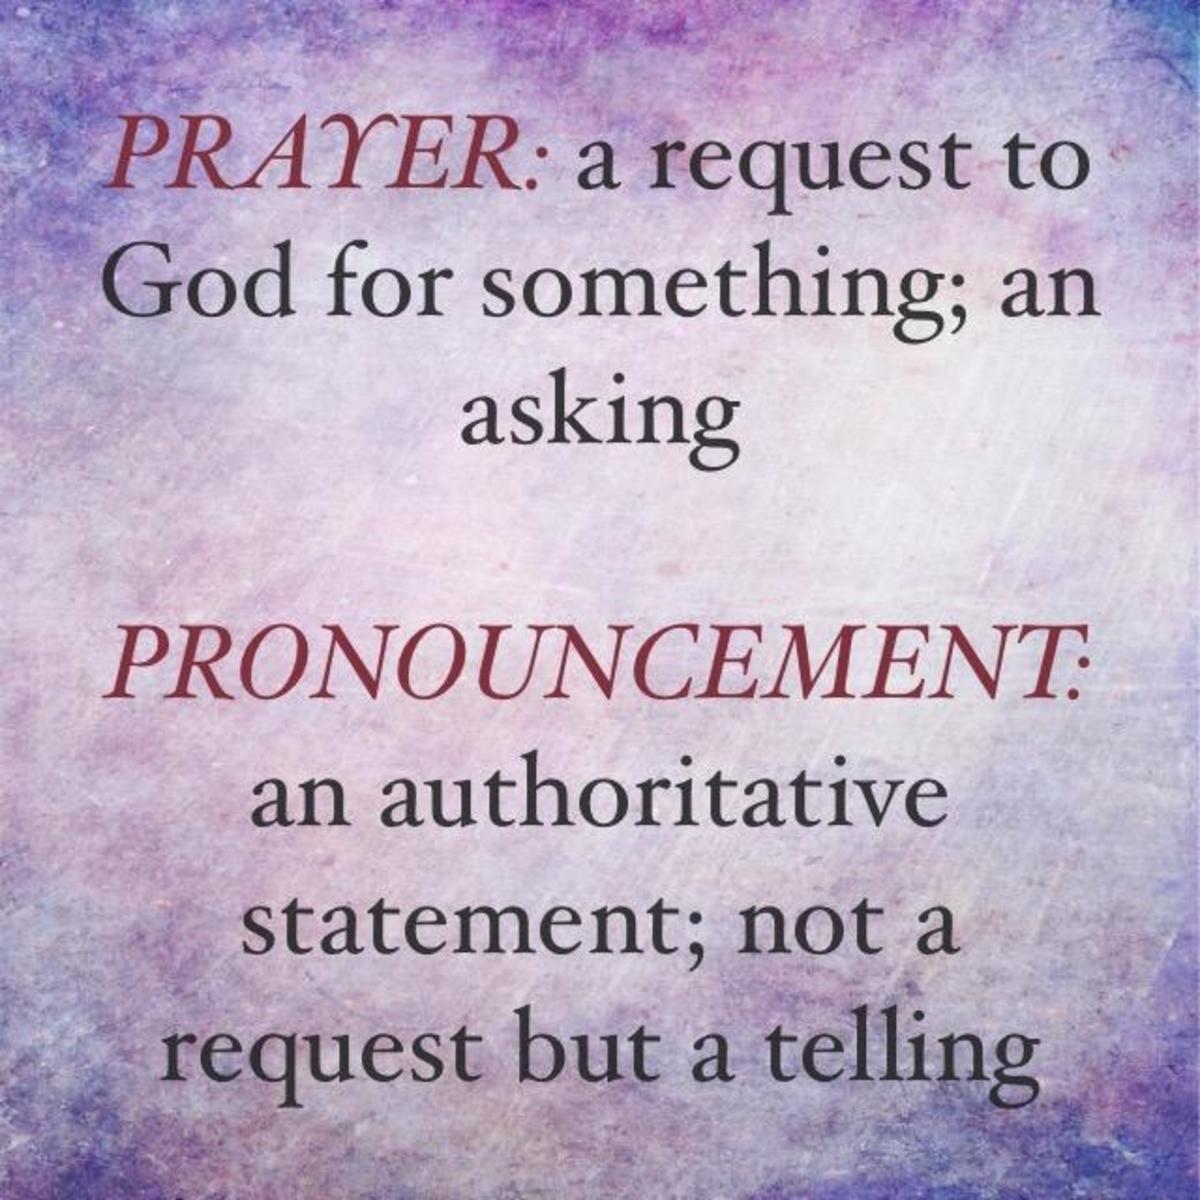 Prayer vs. Pronouncement